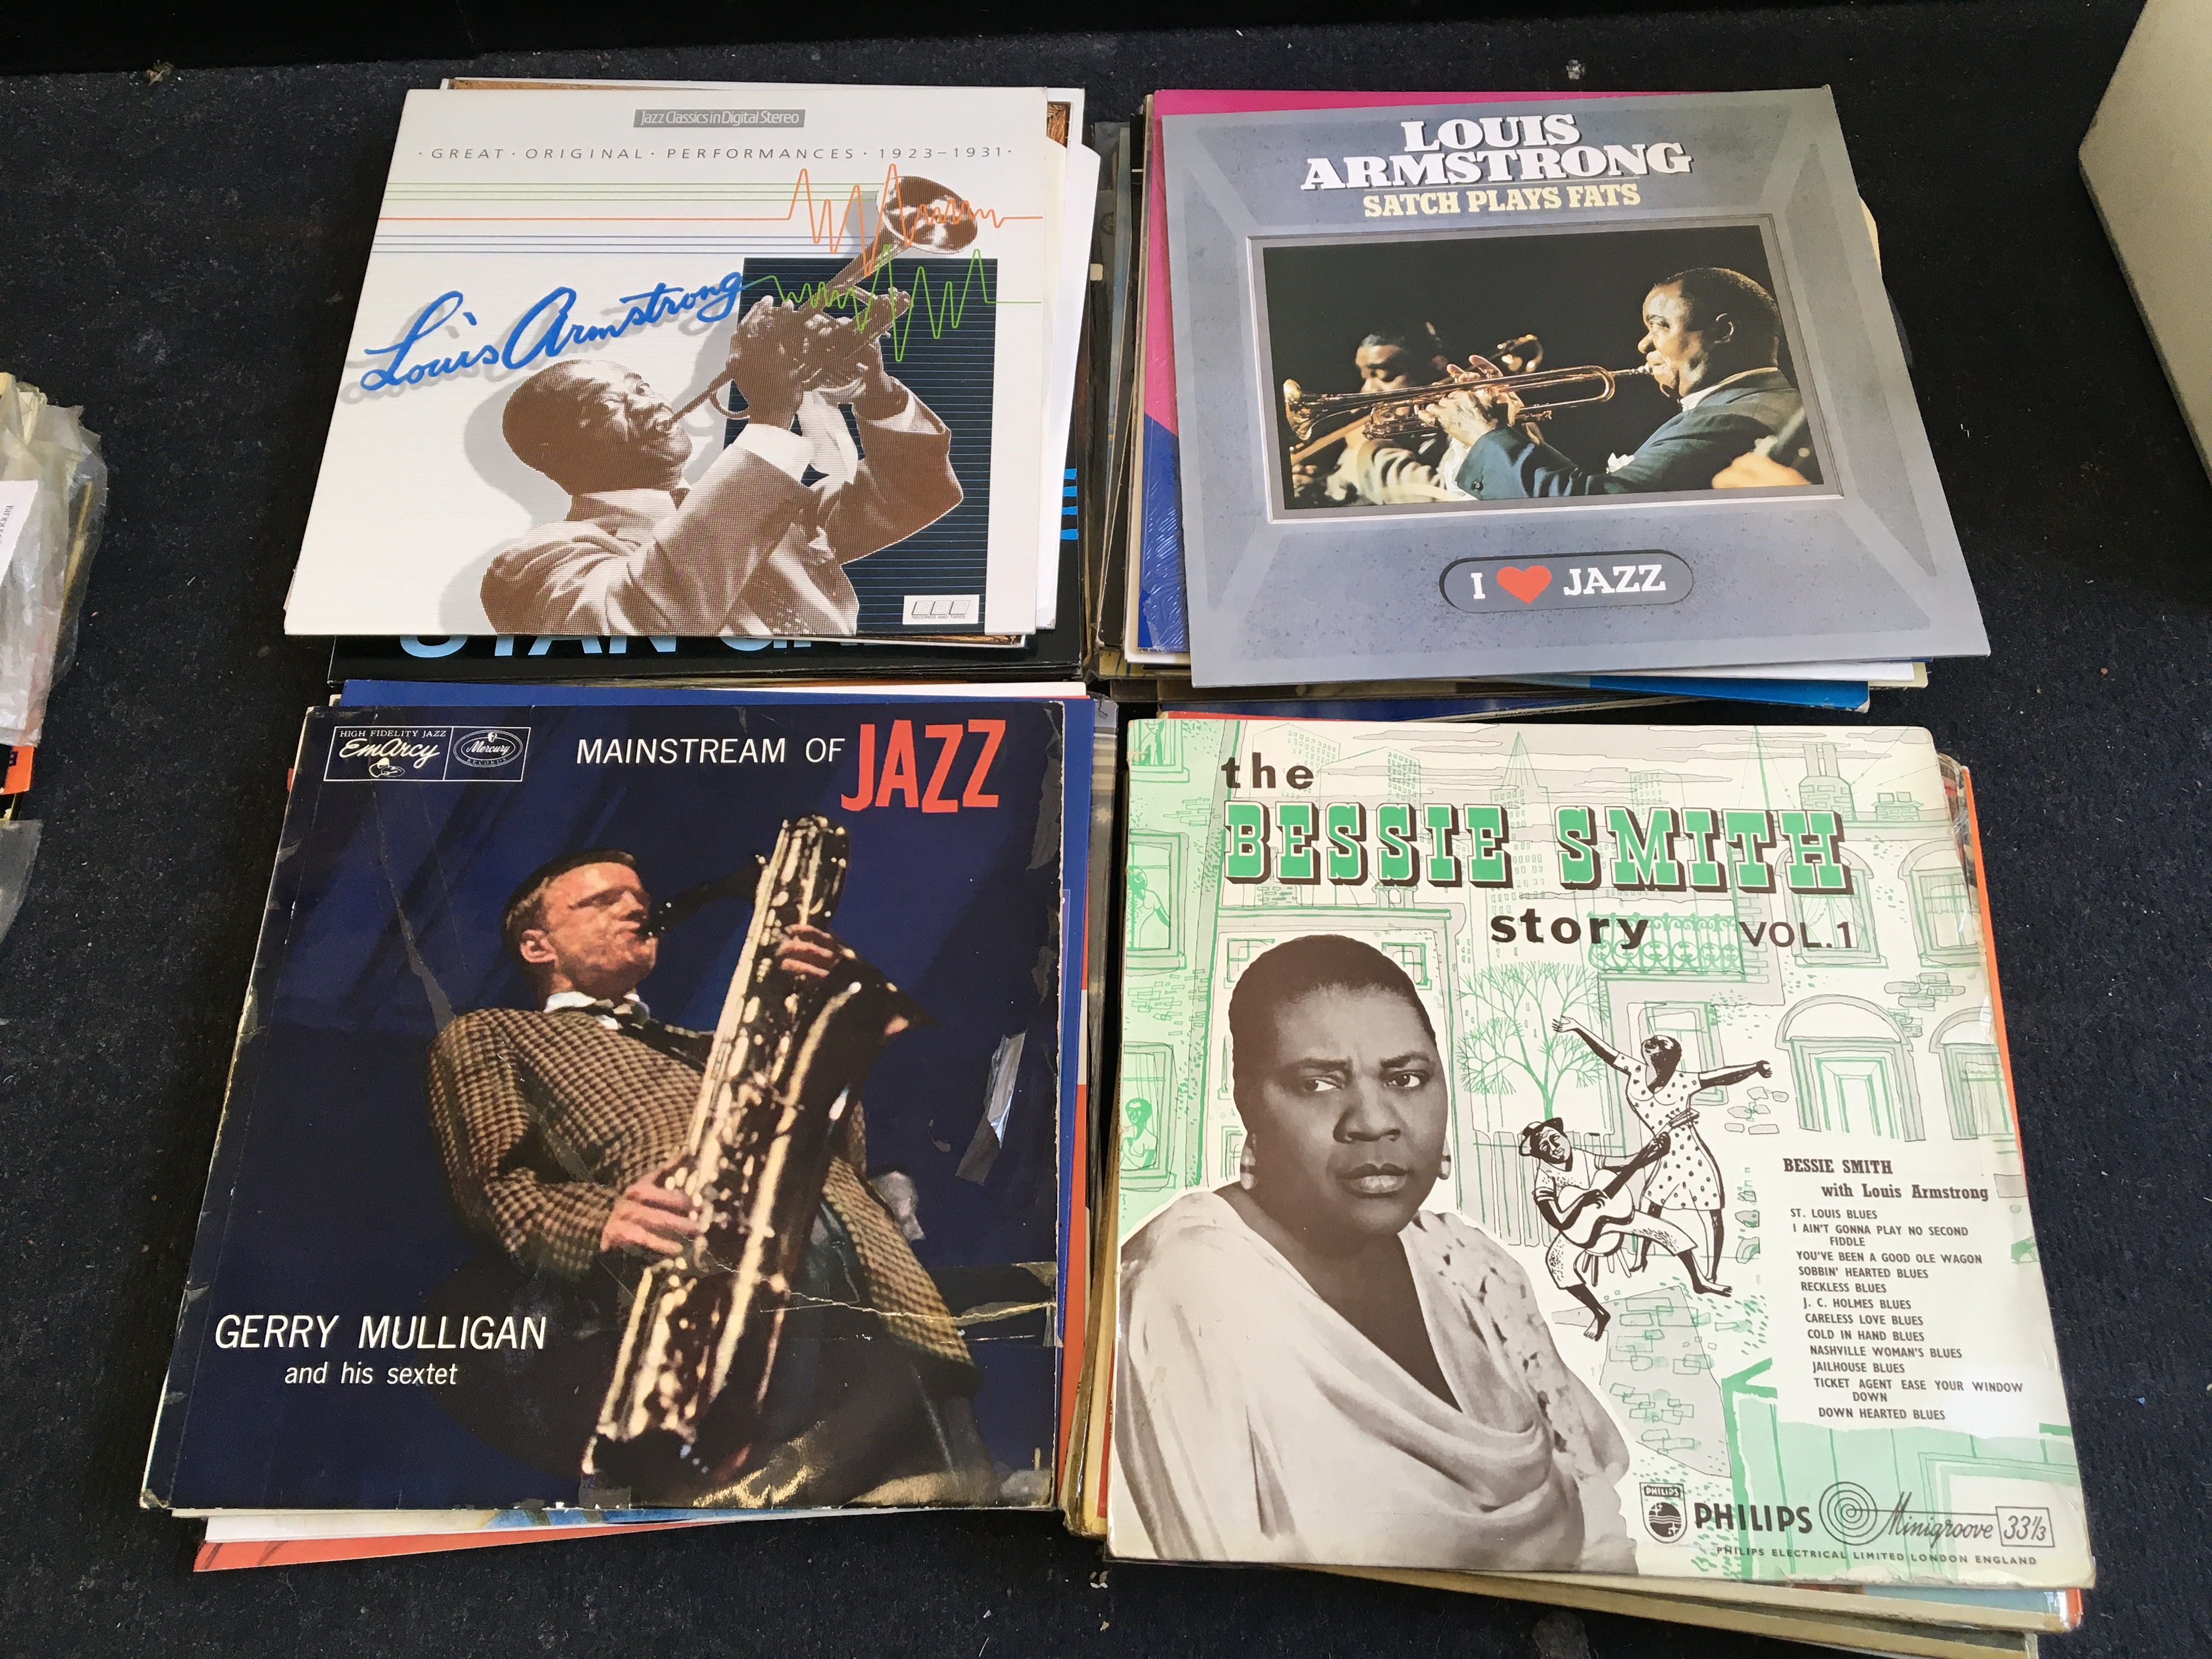 Approx. 100 various jazz vinyl records including Louis Armstrong, Bessie Smith, Duke Ellington, etc.